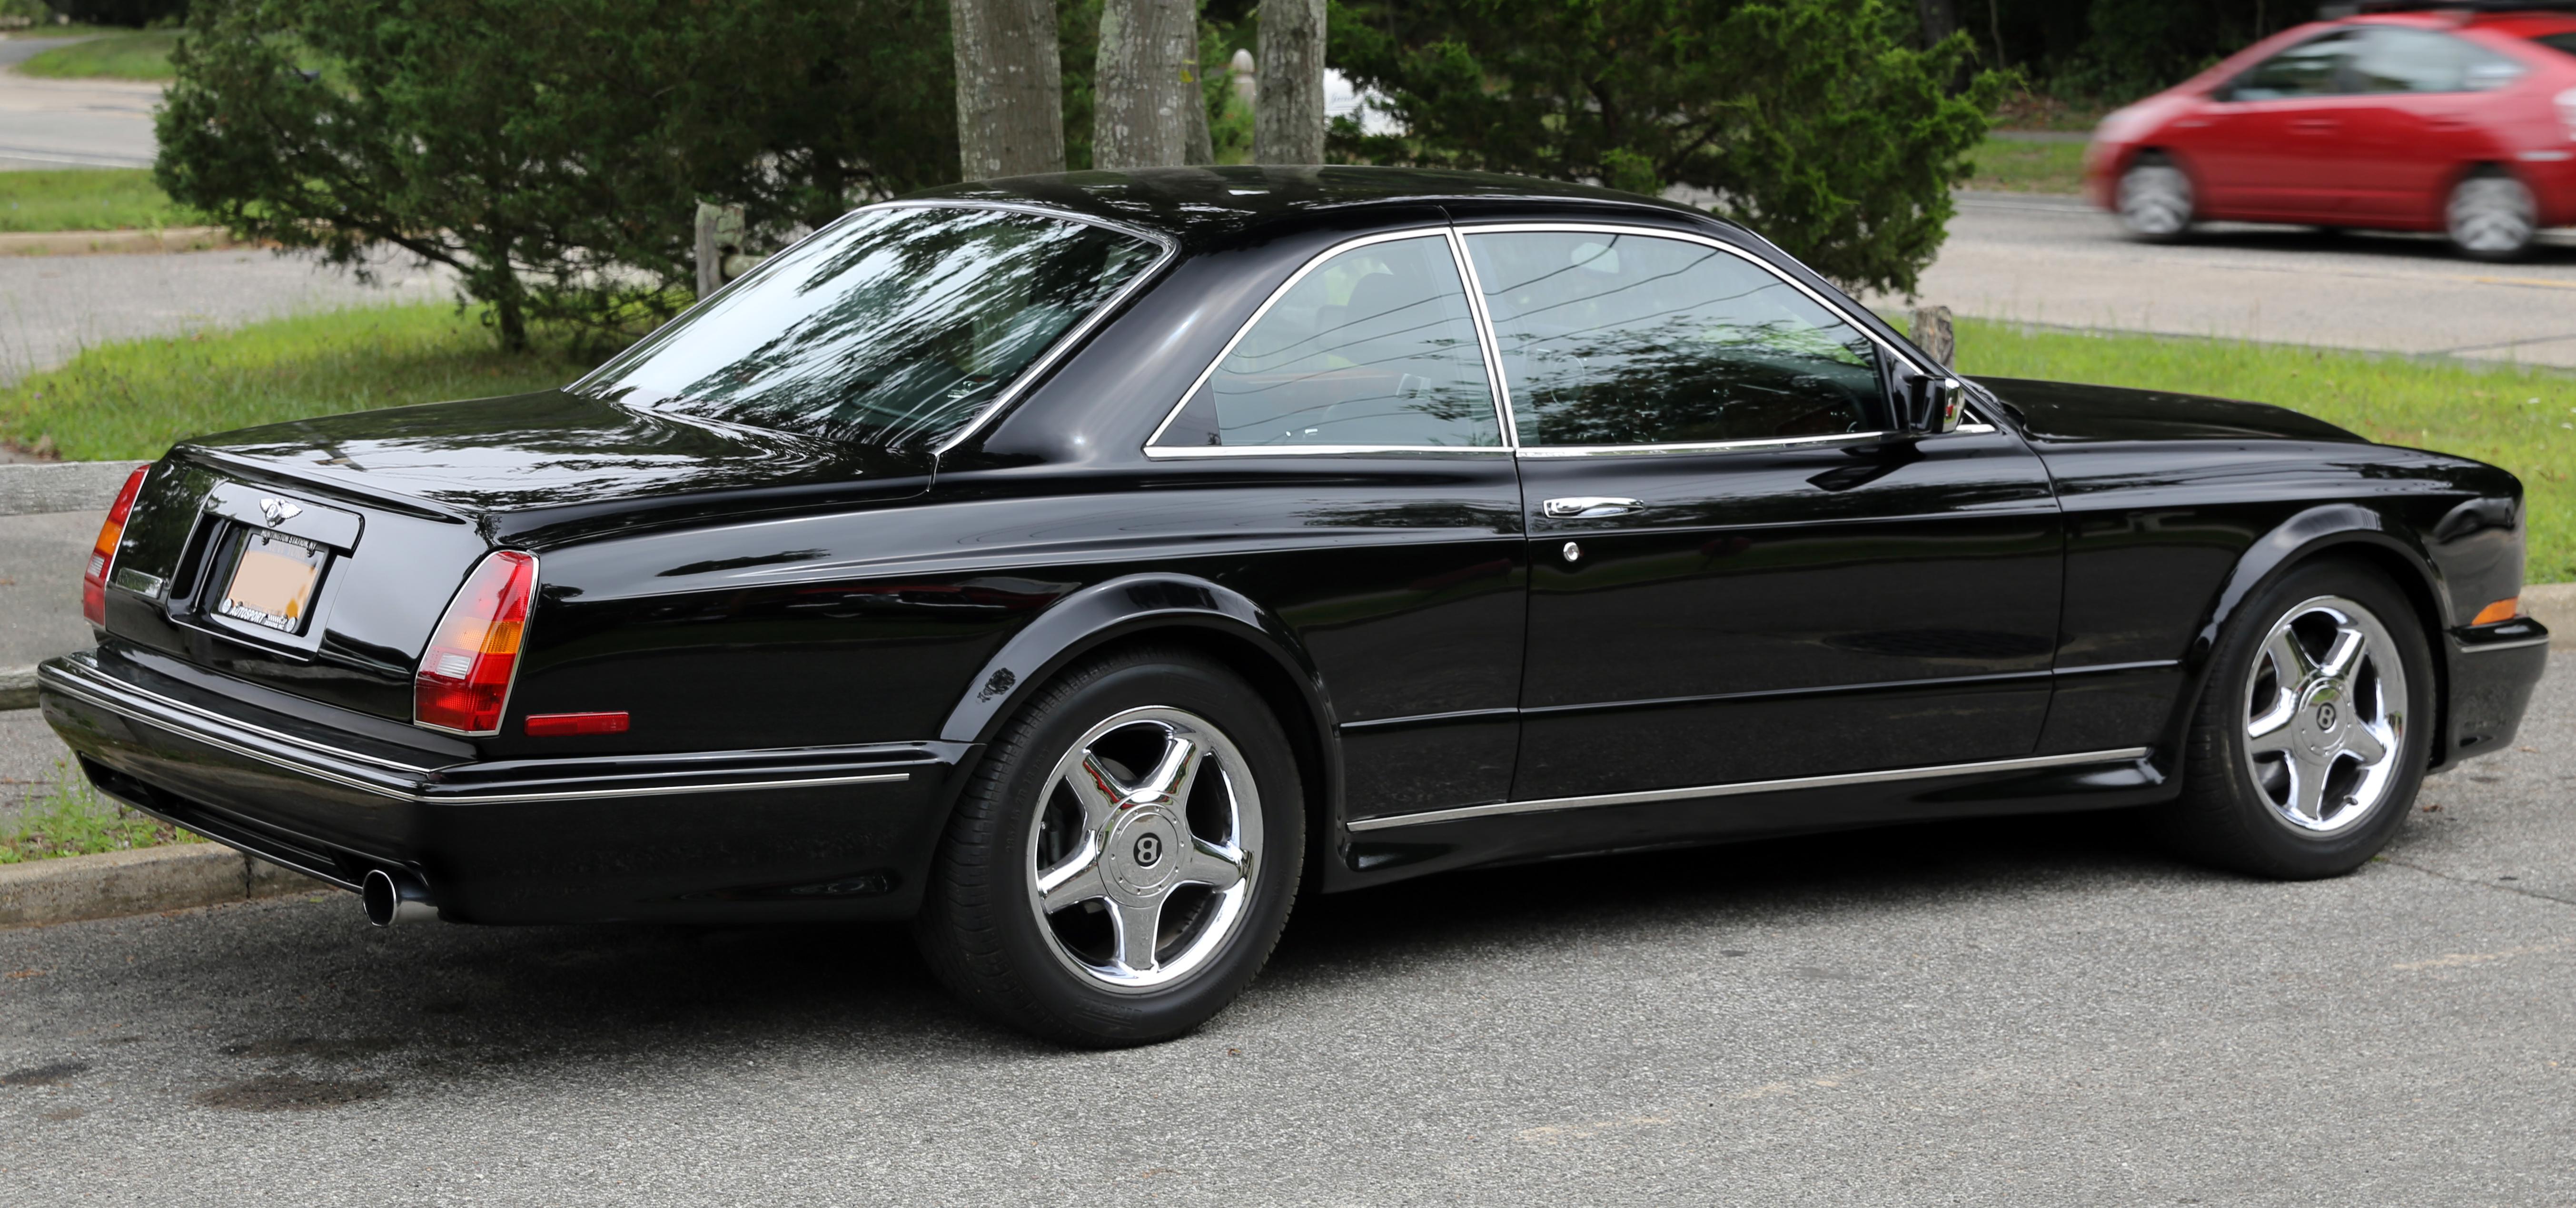 File 2002 Bentley Continental T Rear Right Jpg Wikimedia